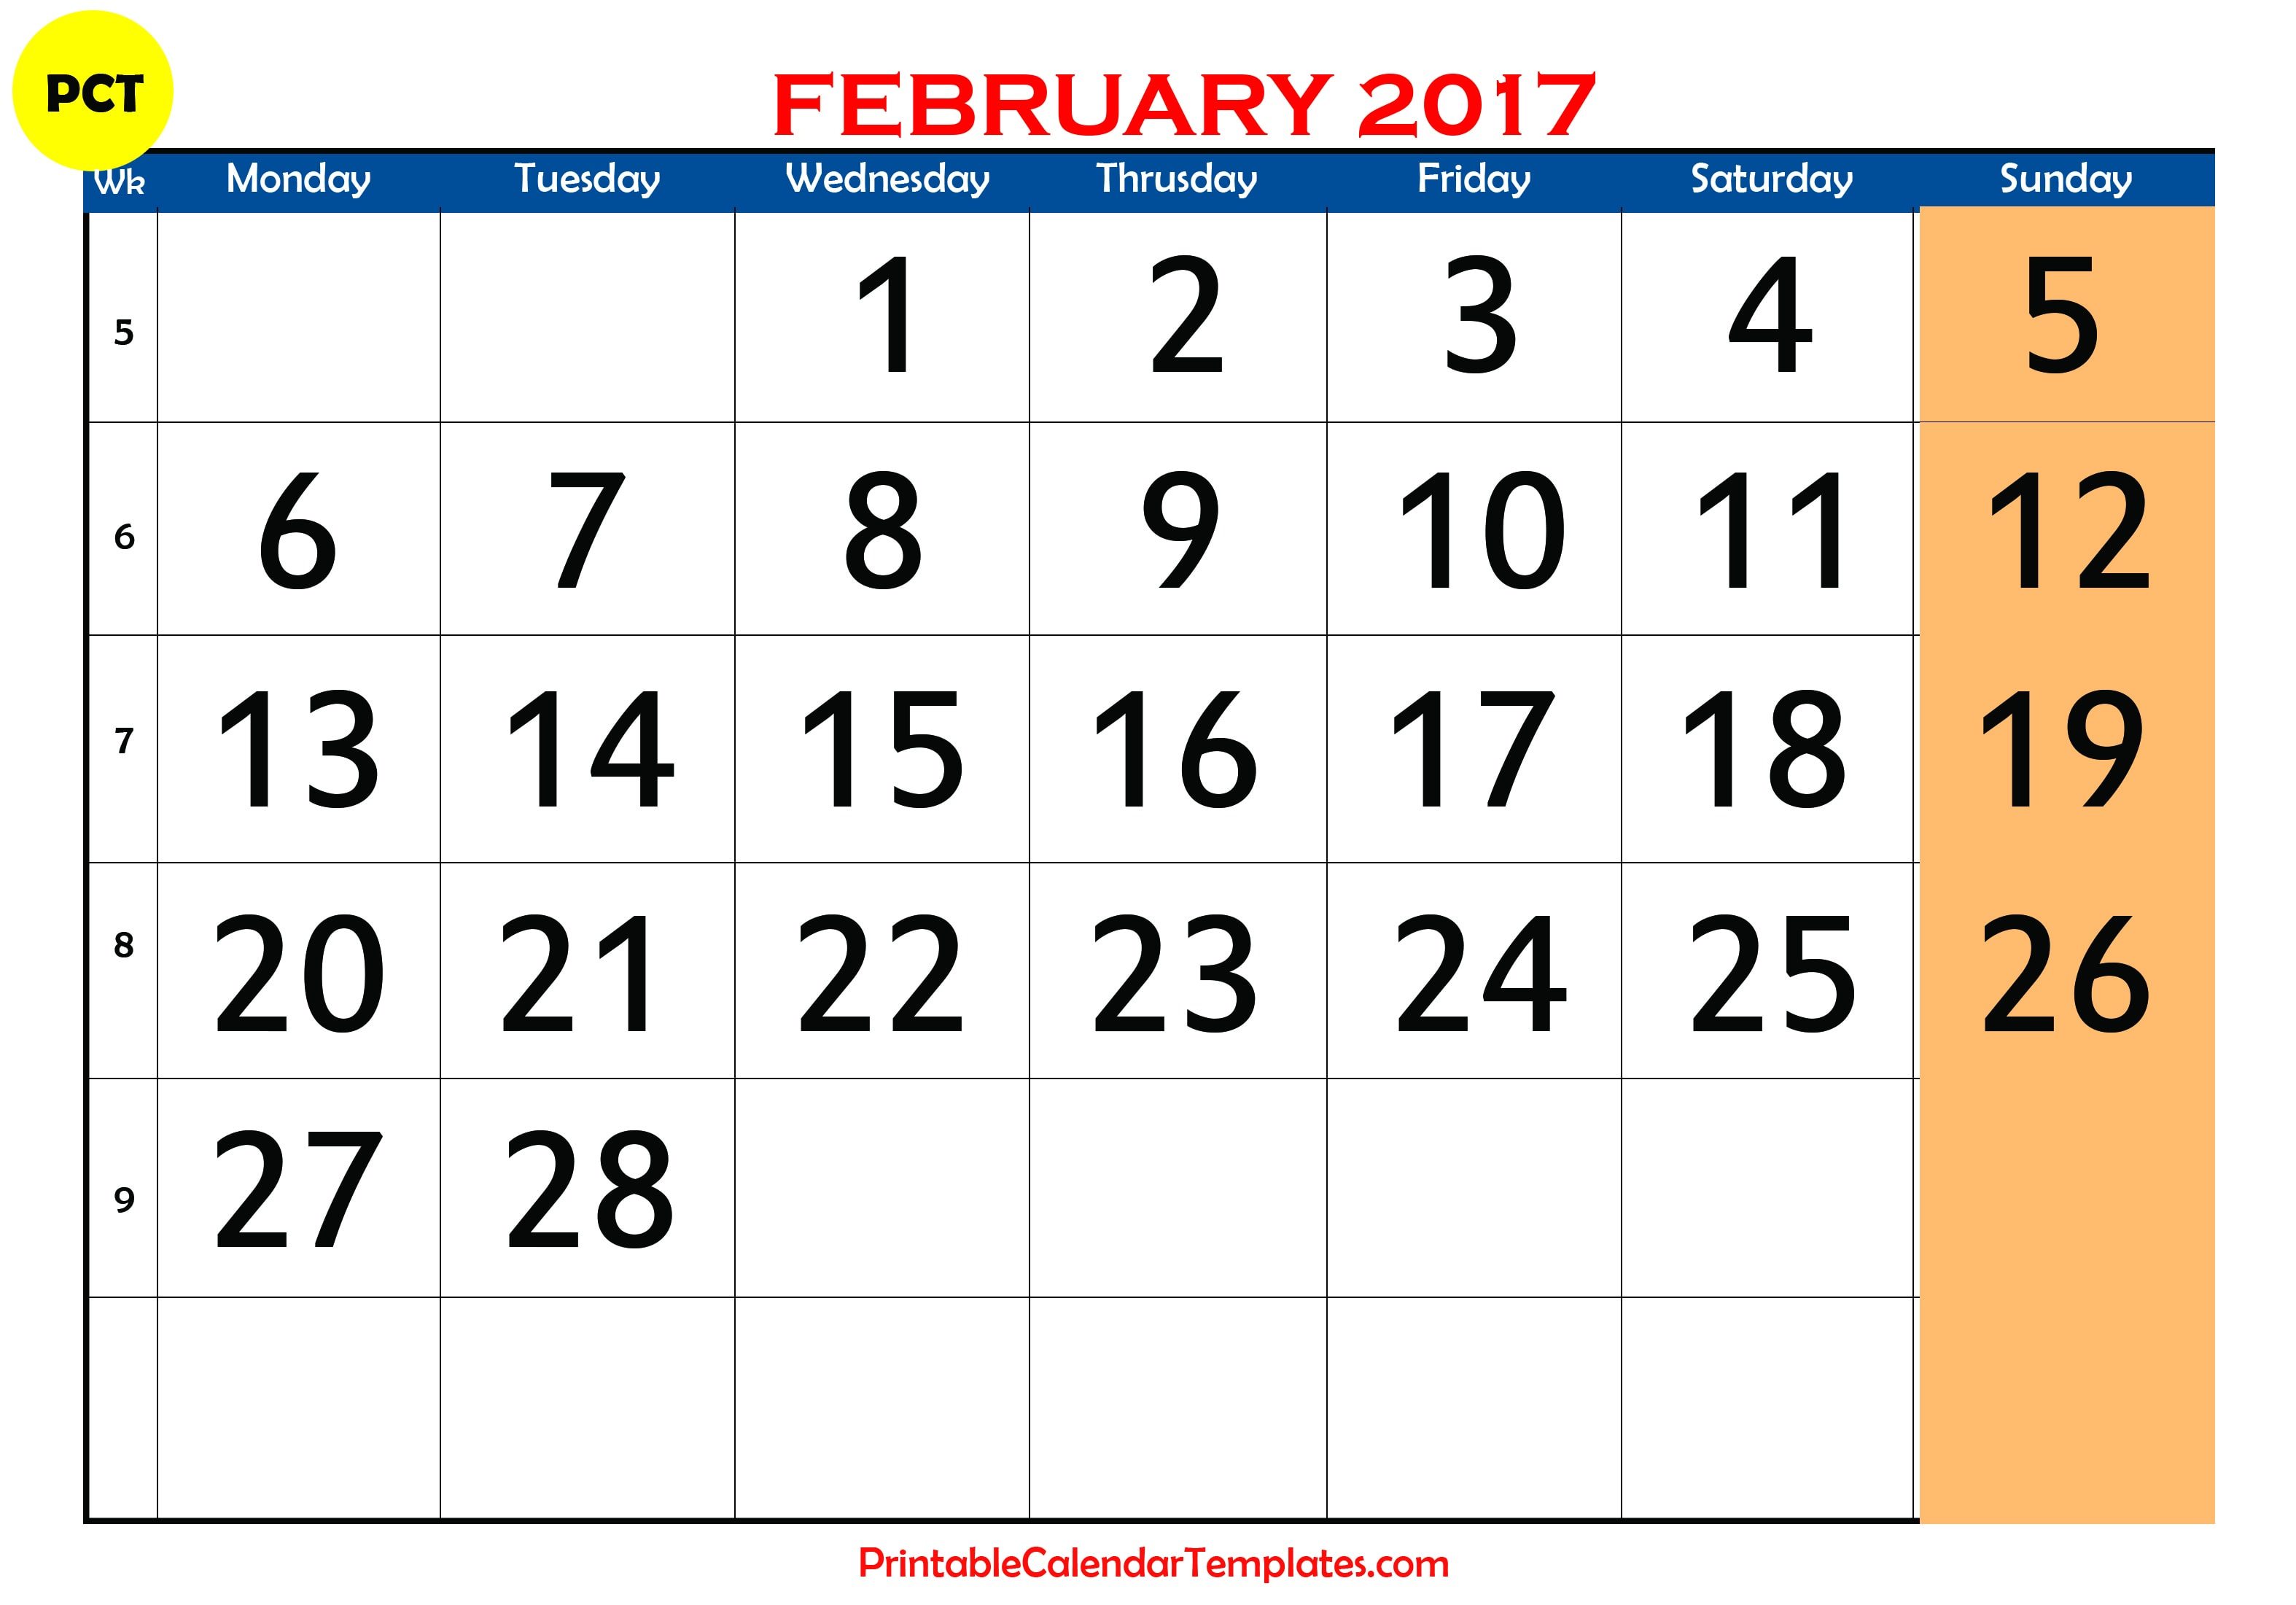 february 2017 calendar printable printable calendar templates